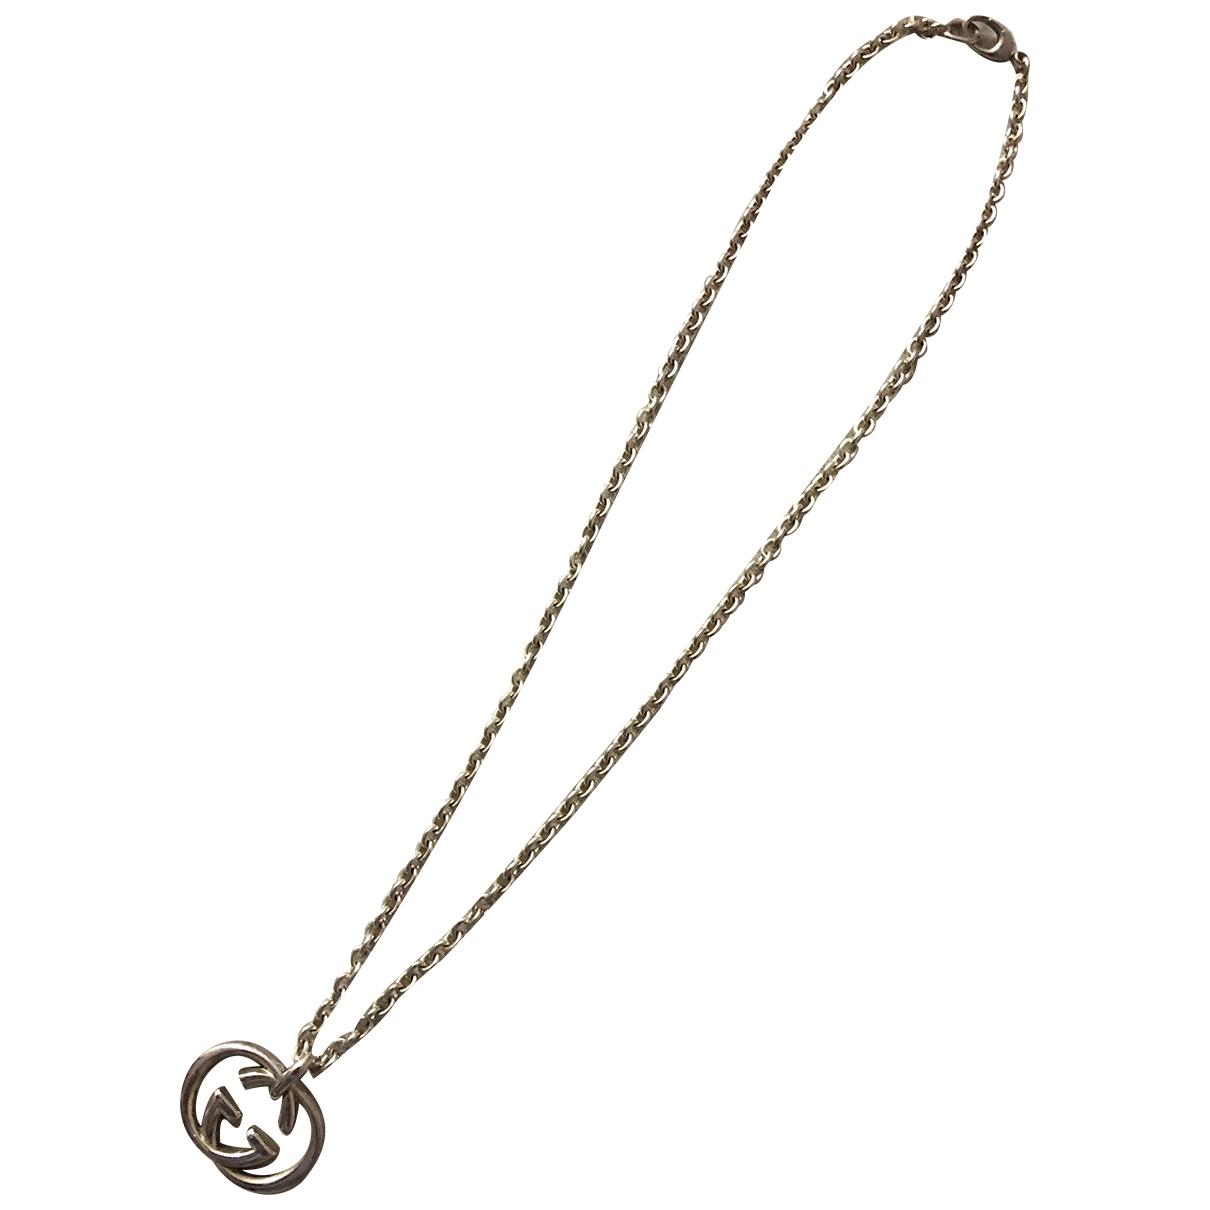 Gucci Icon Kette in  Silber Silber